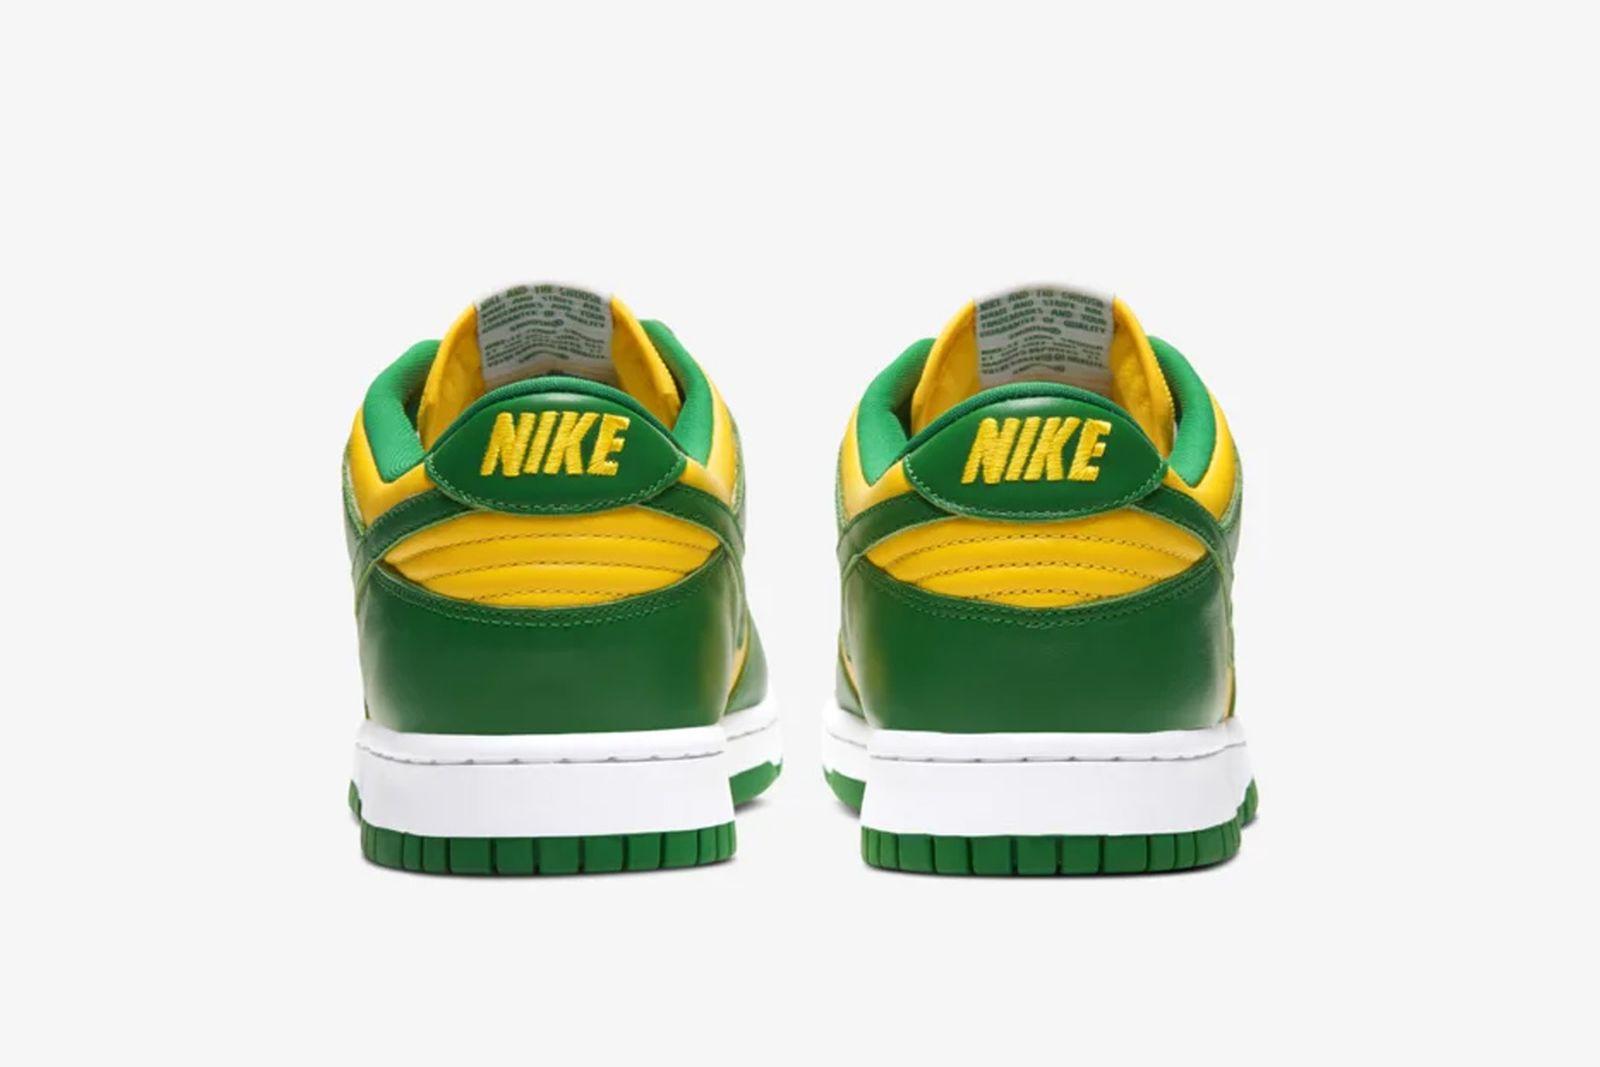 Nike SB Dunk Low Brazil yellow green and white product shot